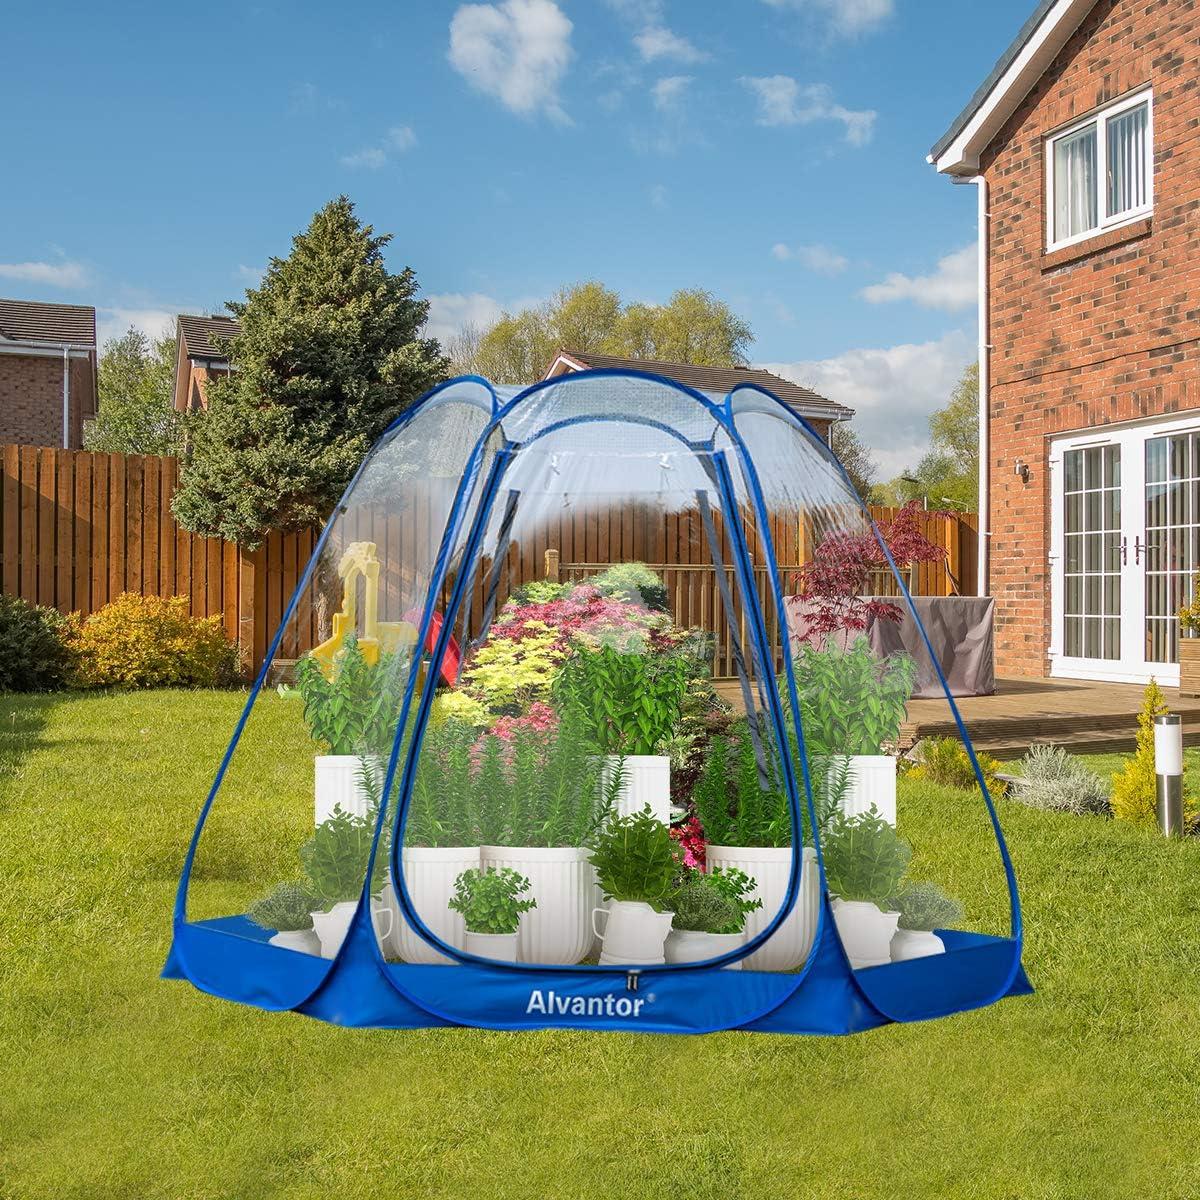 Alvantor Screen House Room Camping Tent Outdoor Canopy Dining Gazebo Pop Up Sun Shade Hexagon Shelter Mesh Walls Not Waterproof 10x10 Beige Patent